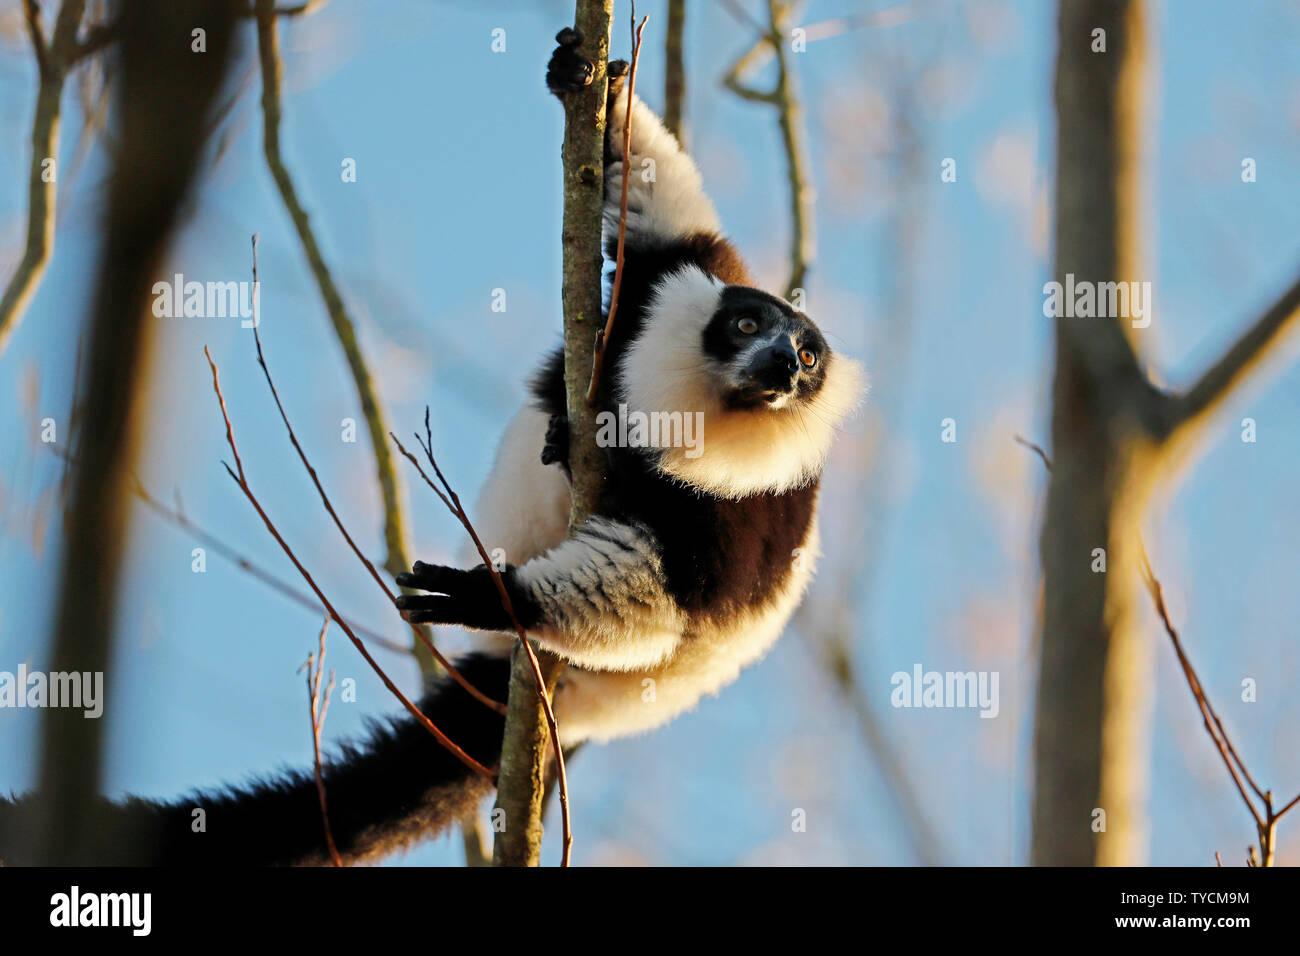 black-and-white ruffed lemur, (Varecia variegata), captive Stock Photo